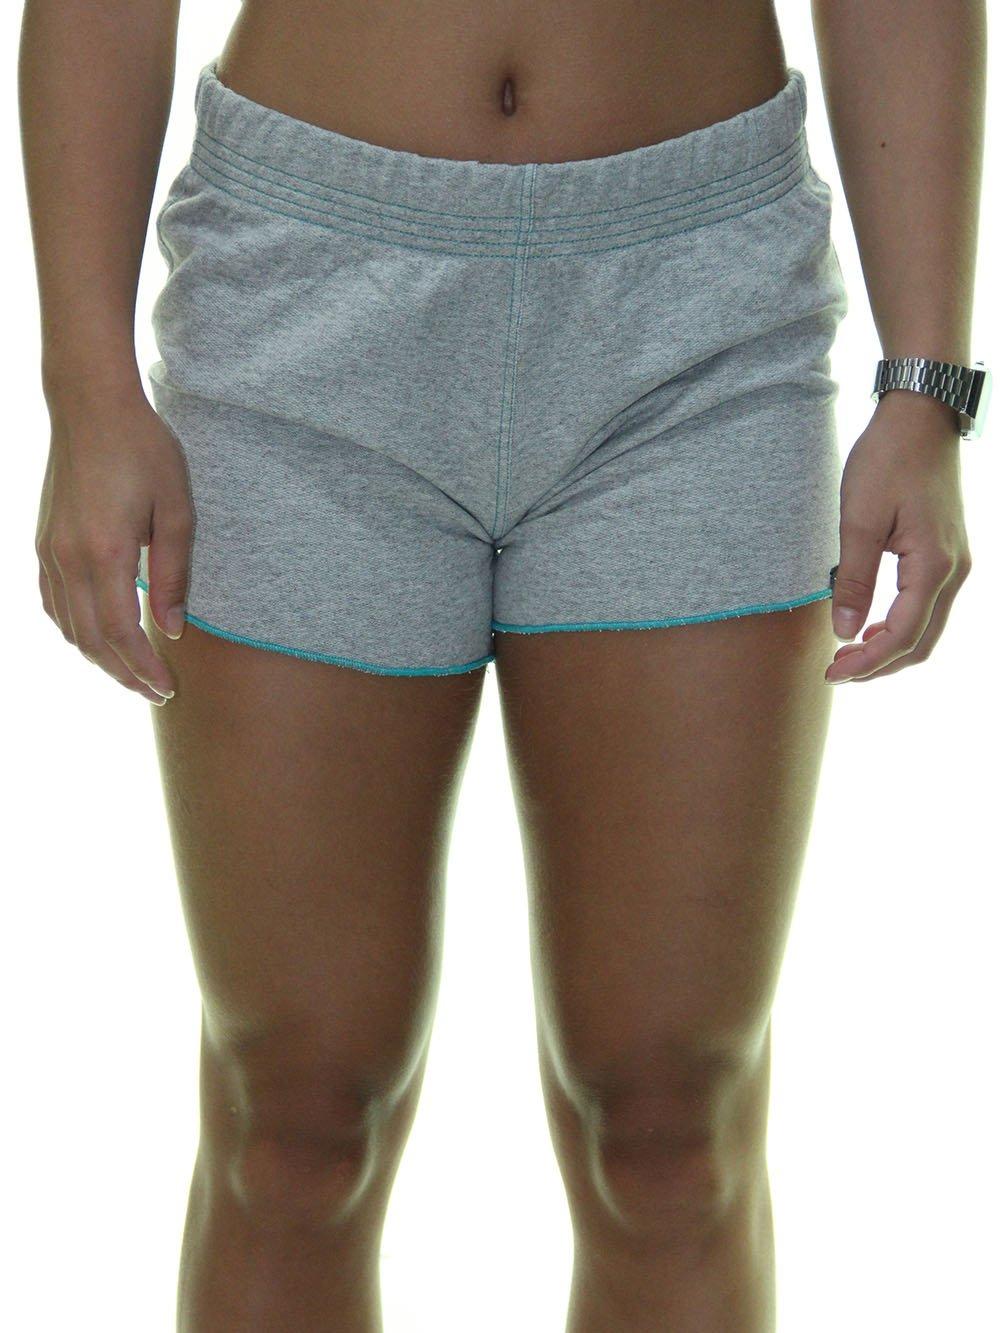 Shorts Feminino Hurley Malha All de Moletom - Cinza Mesclado ... 71bce91bf61